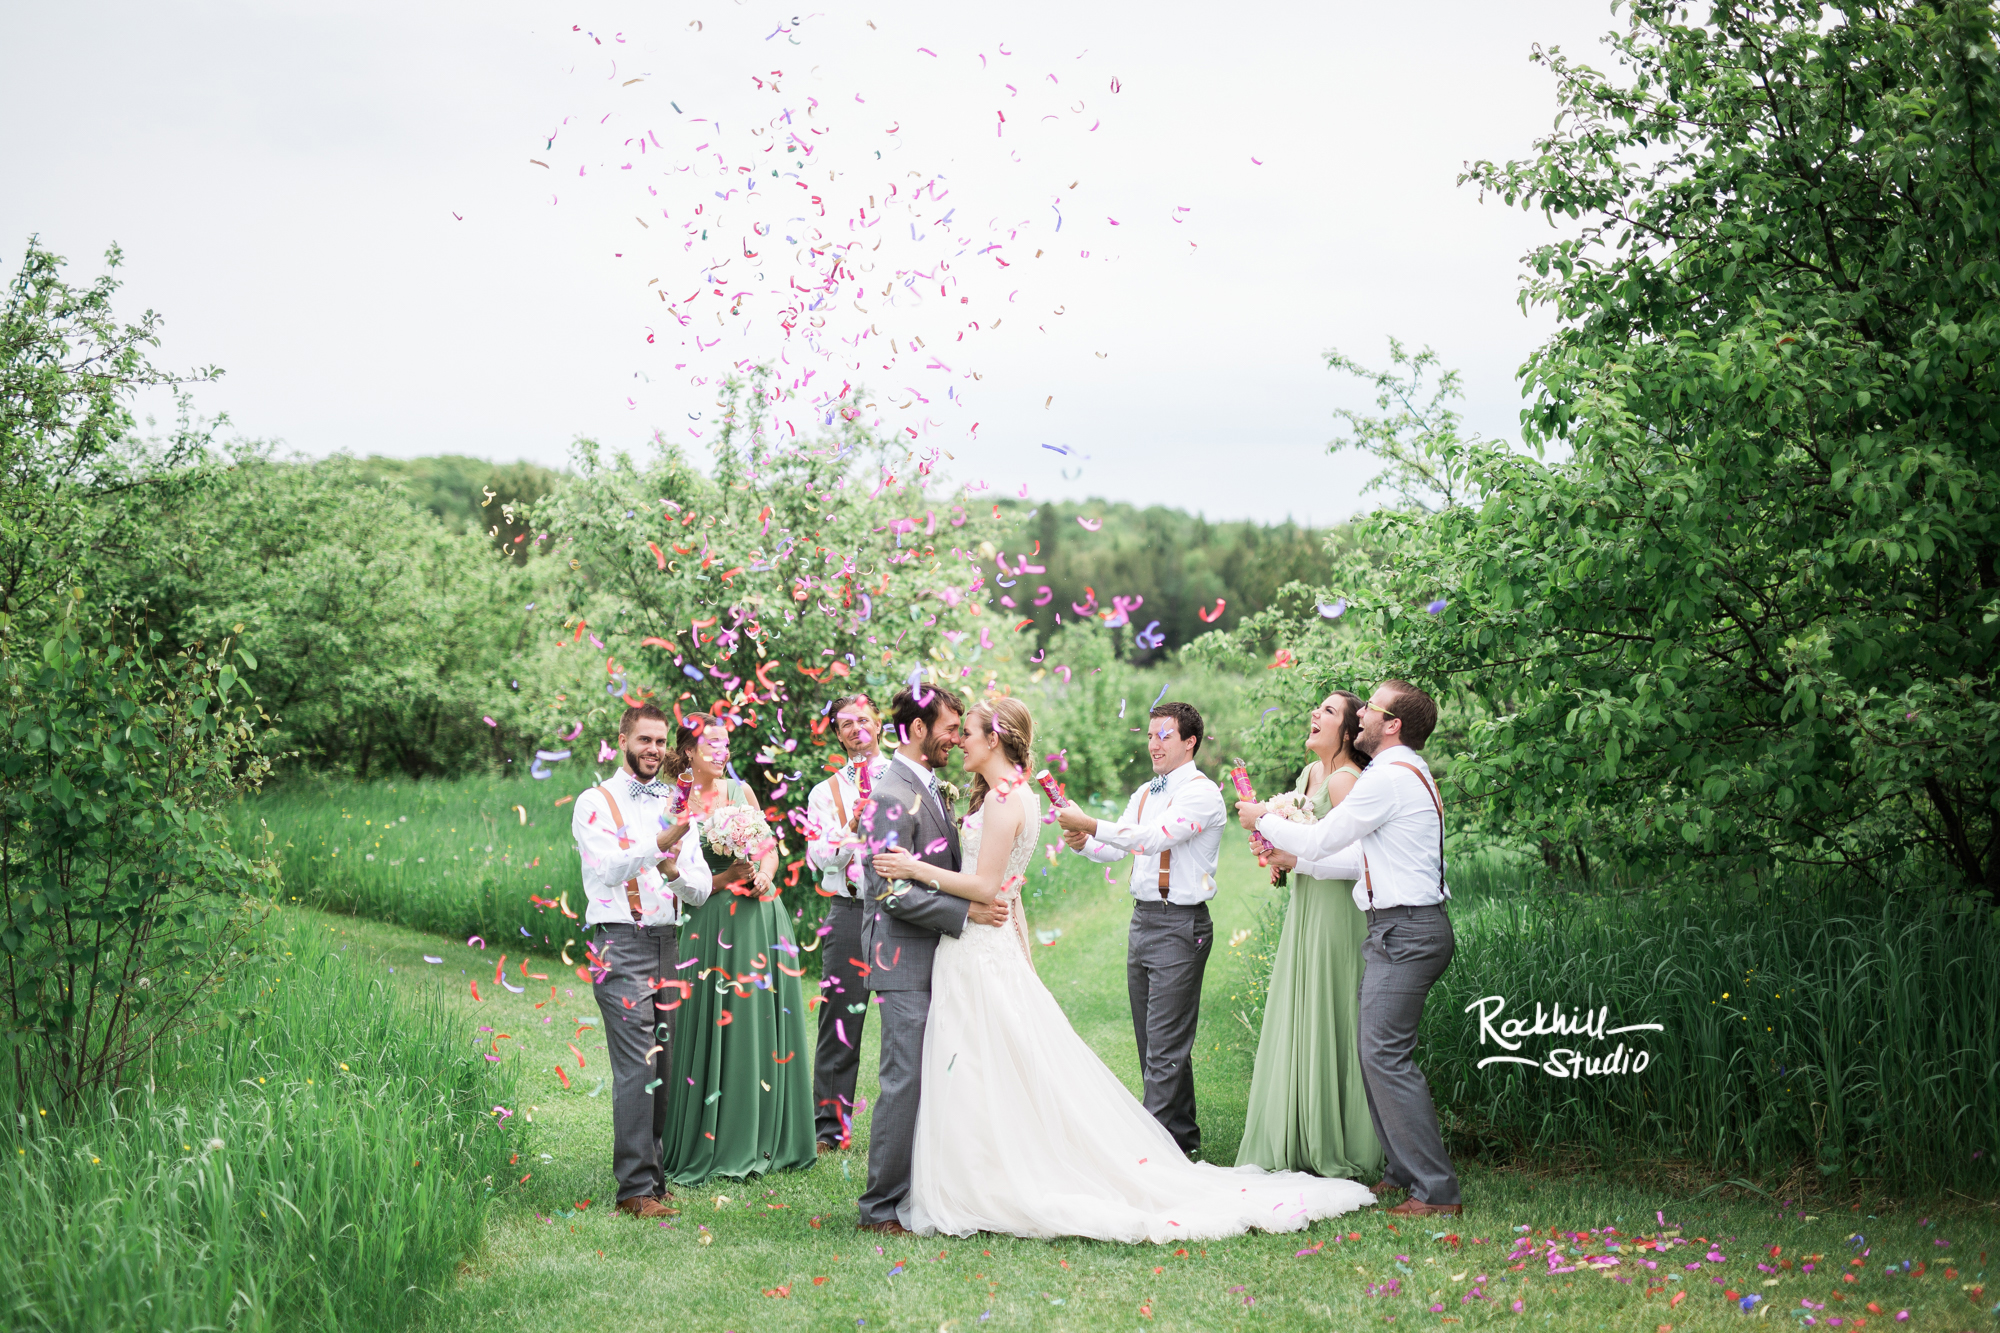 Traverse-city-wedding-photographer-rockhill-studio-confetti-party-1.jpg